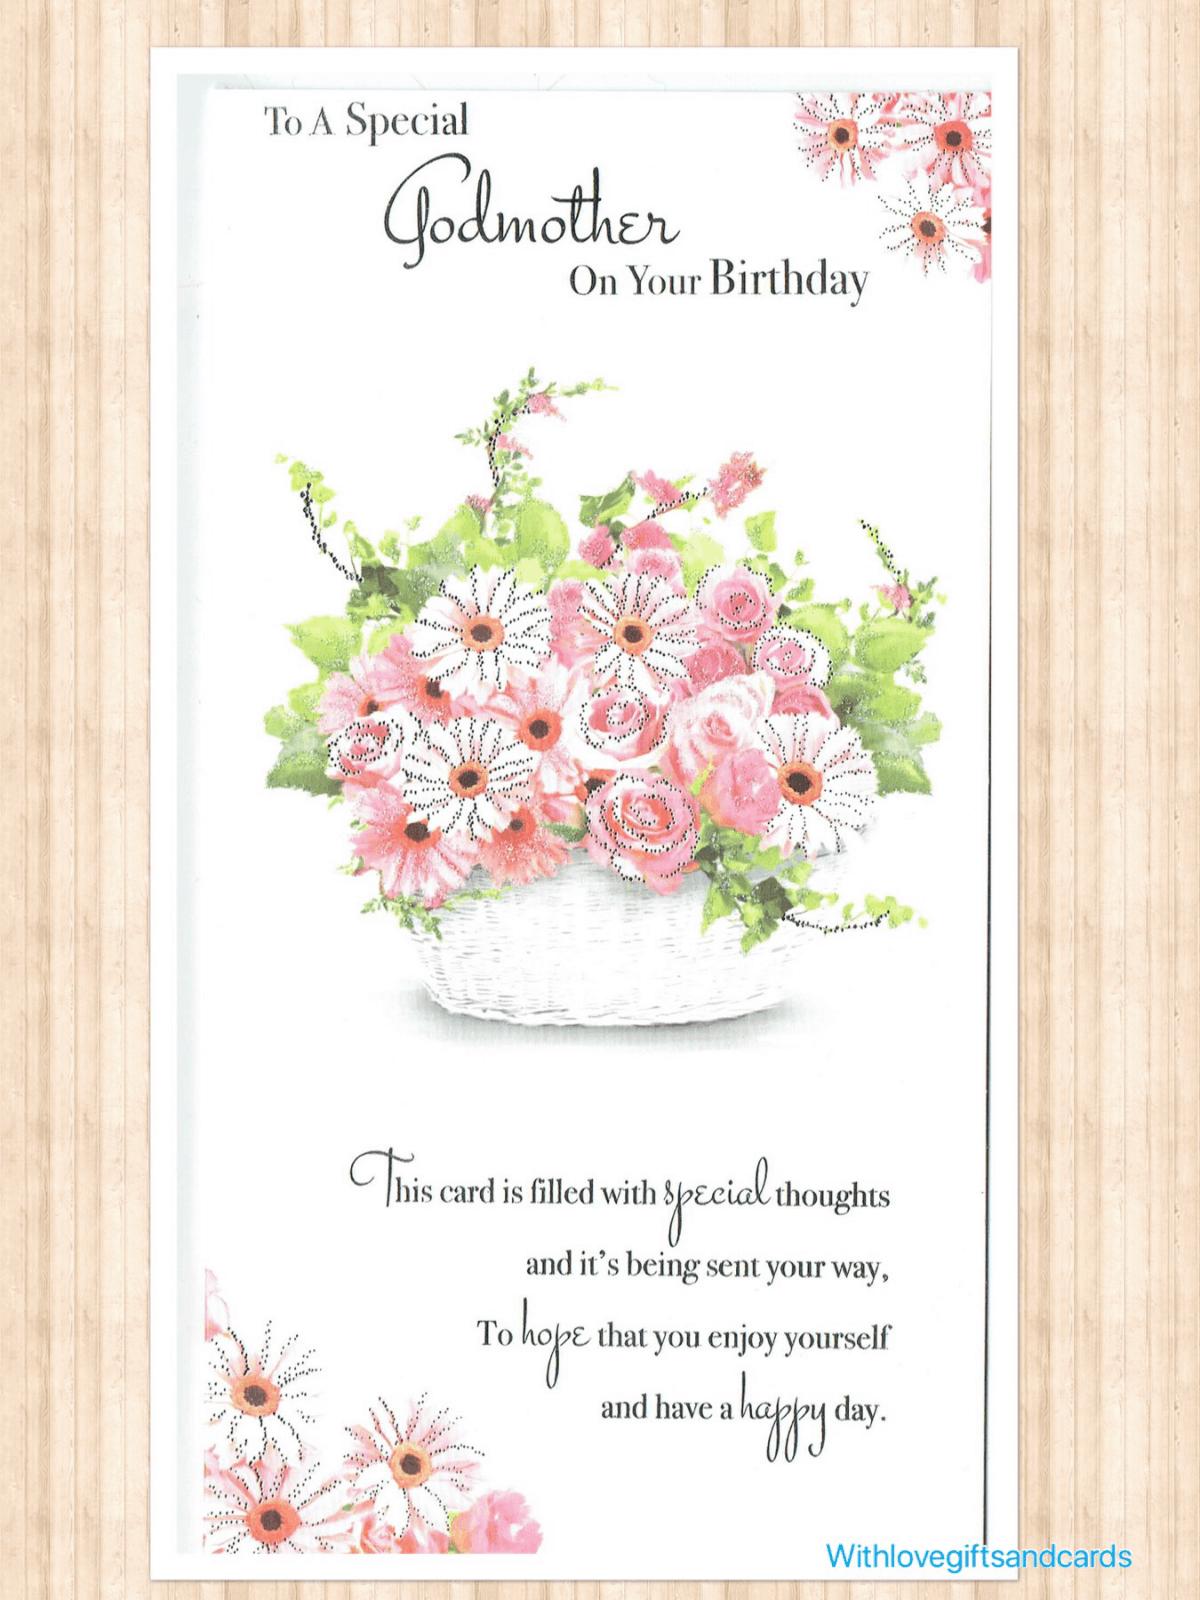 Variation Of Godmother Birthday Card Choice Three